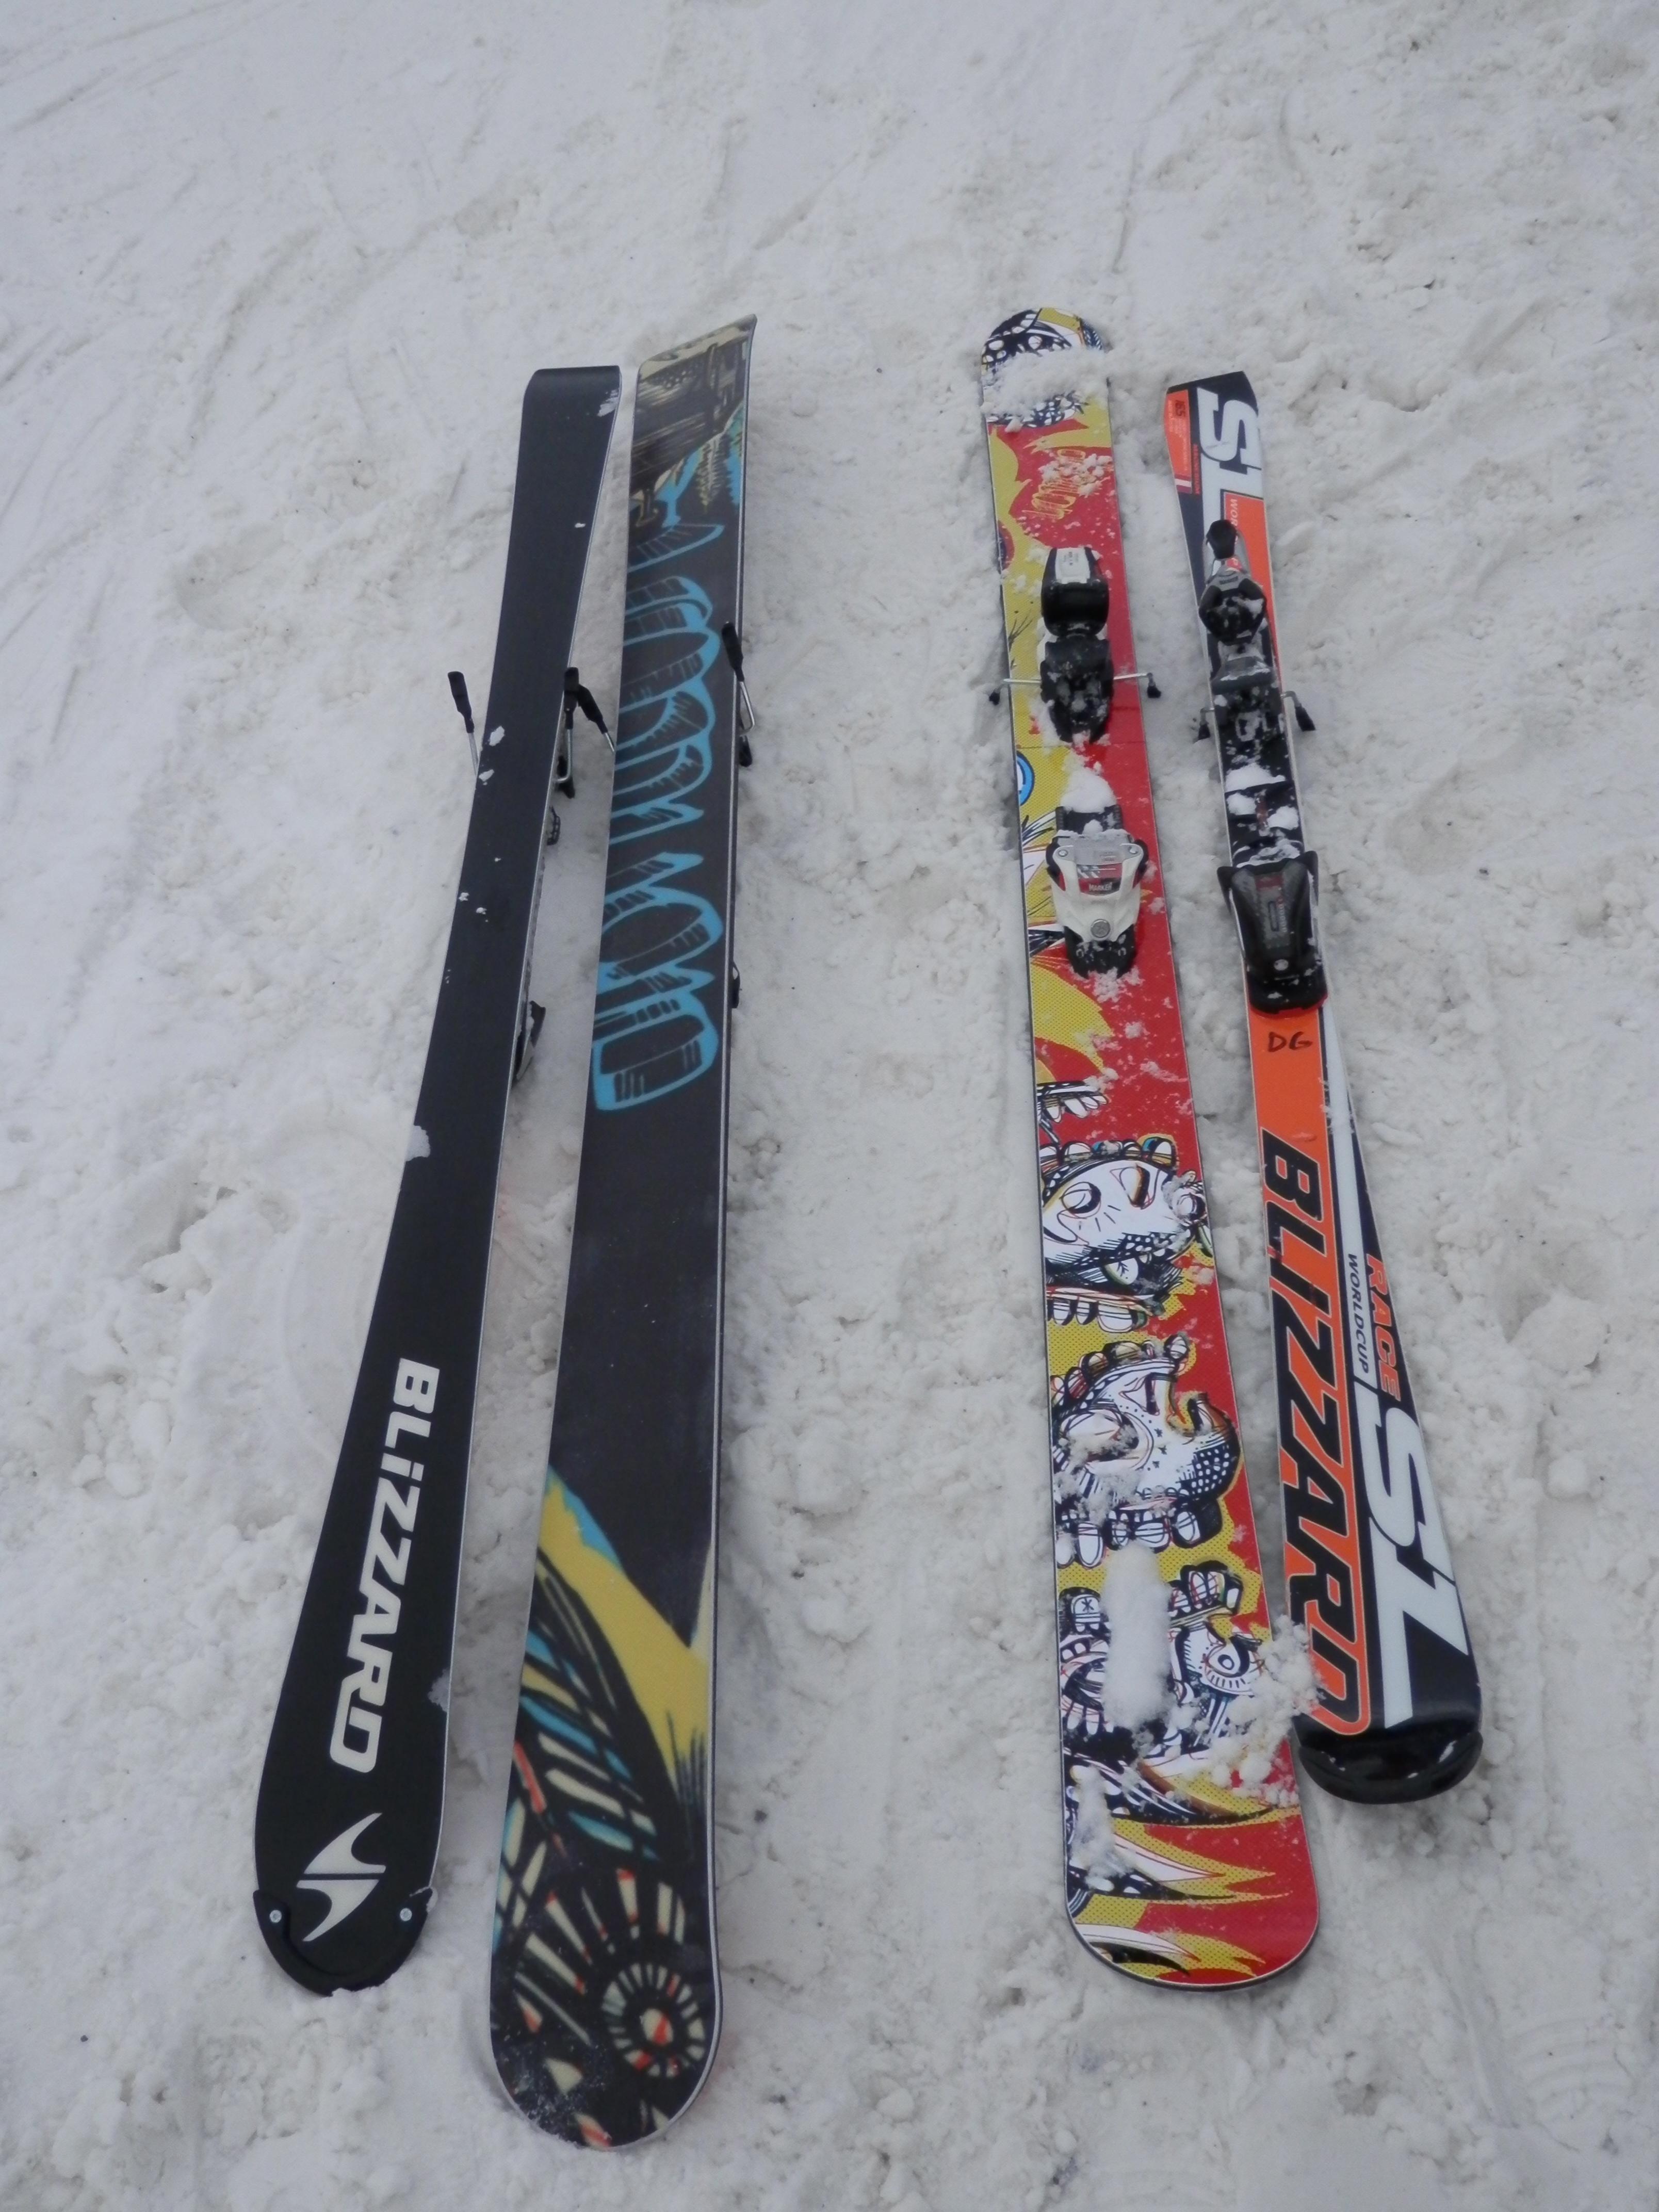 Nordica Hot Rod Tempest Skis Nordica Hot Rod Ski Boots